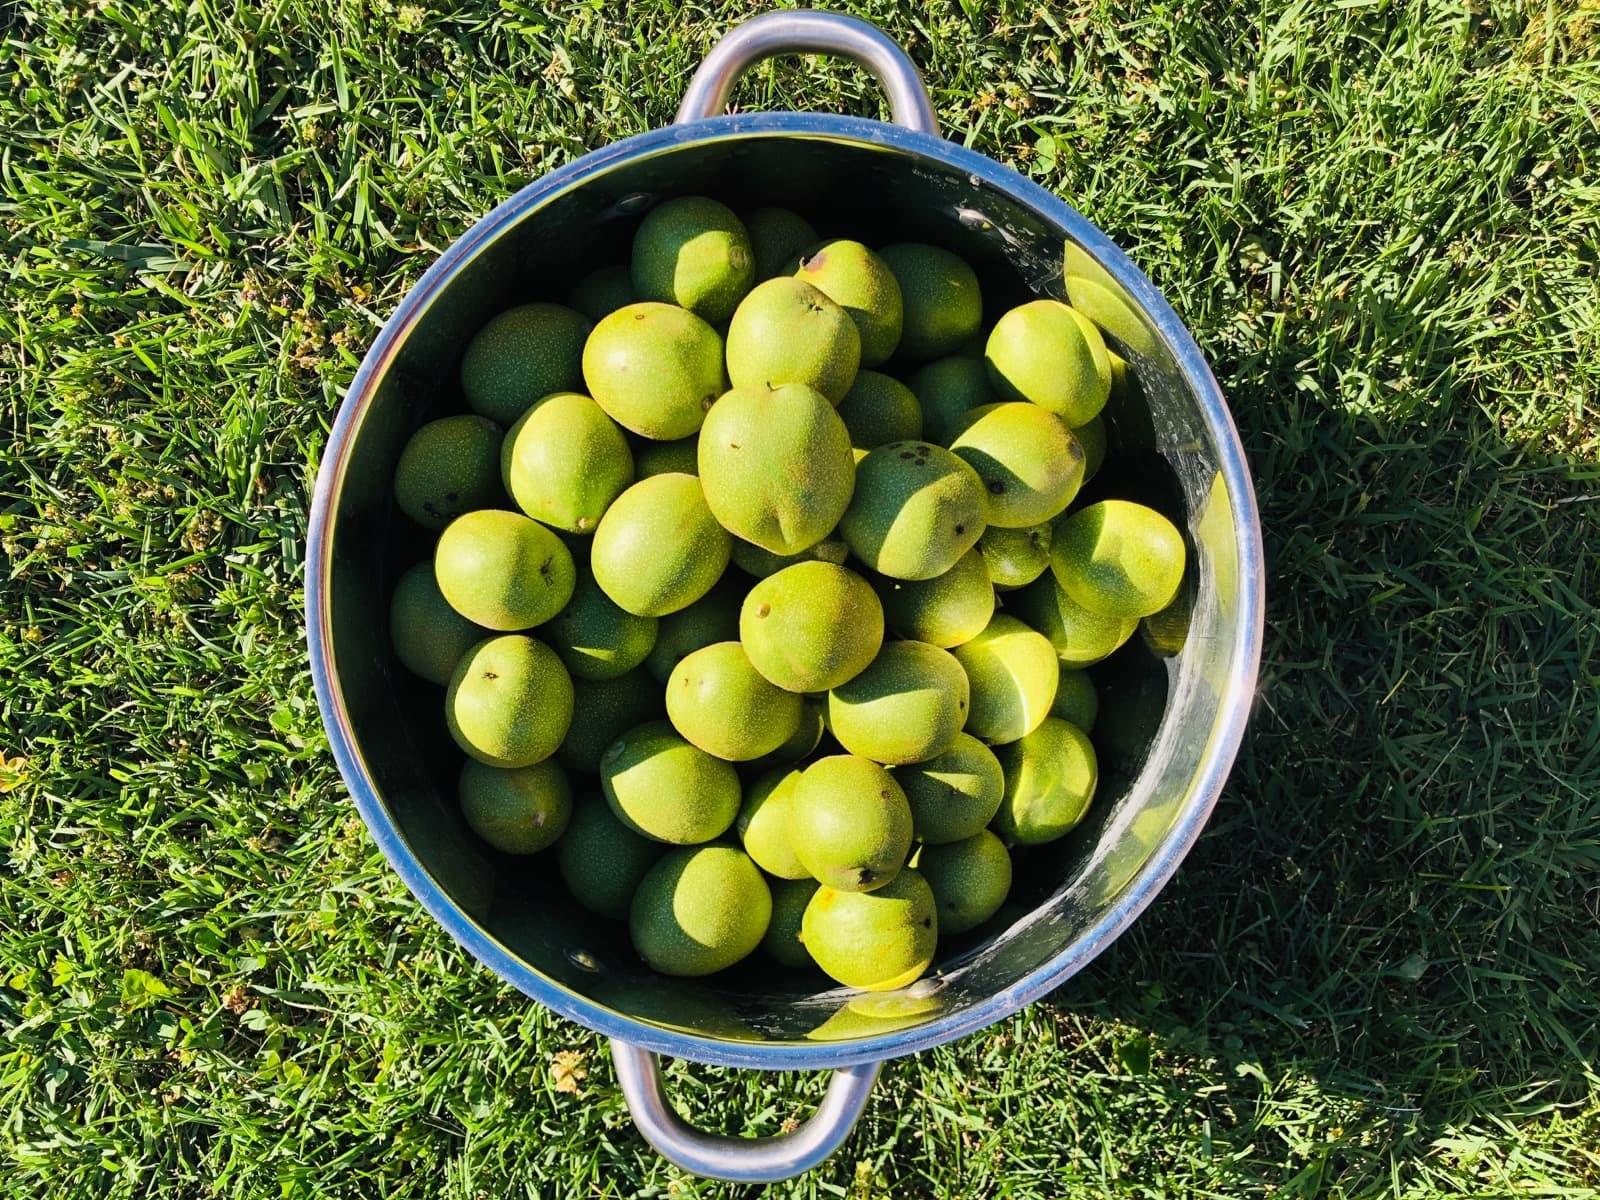 How to prepare Nocino, liqueur from Modena